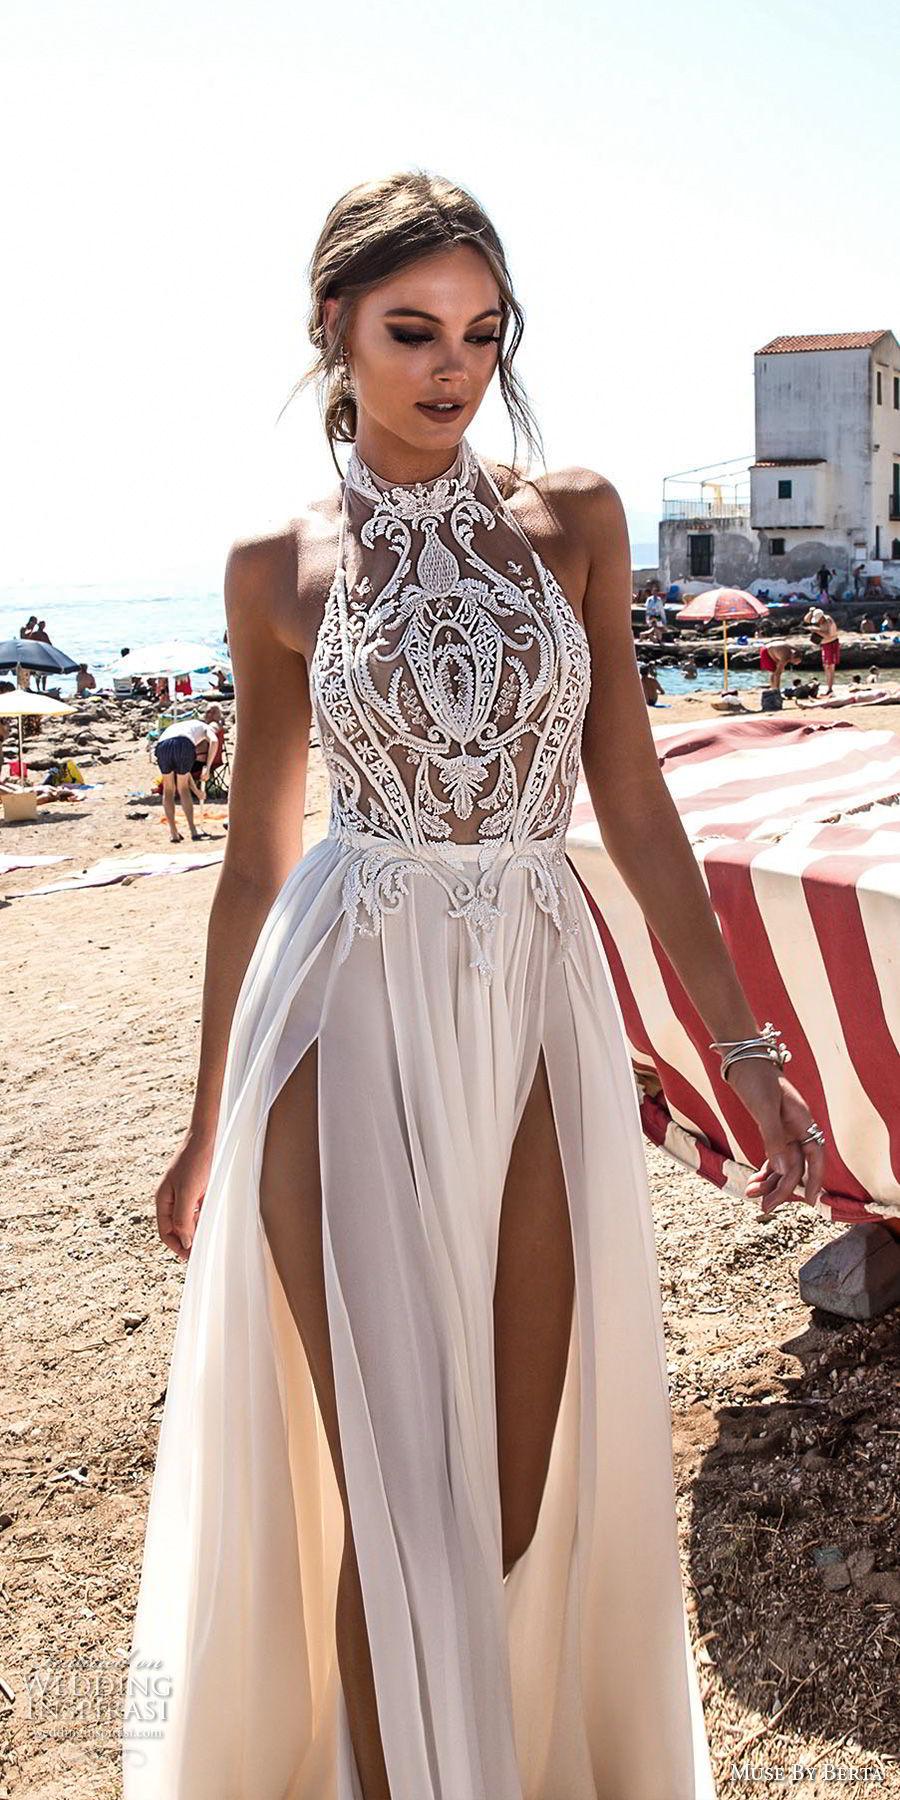 muse-berta-2018-bridal-sleeveless-high-neck-halter-neck-heavily-embellished-bodice-high-slit-skirt-sexy-glamorous-soft-a-line-wedding-dress-open-back-sweep-train-5-mv-